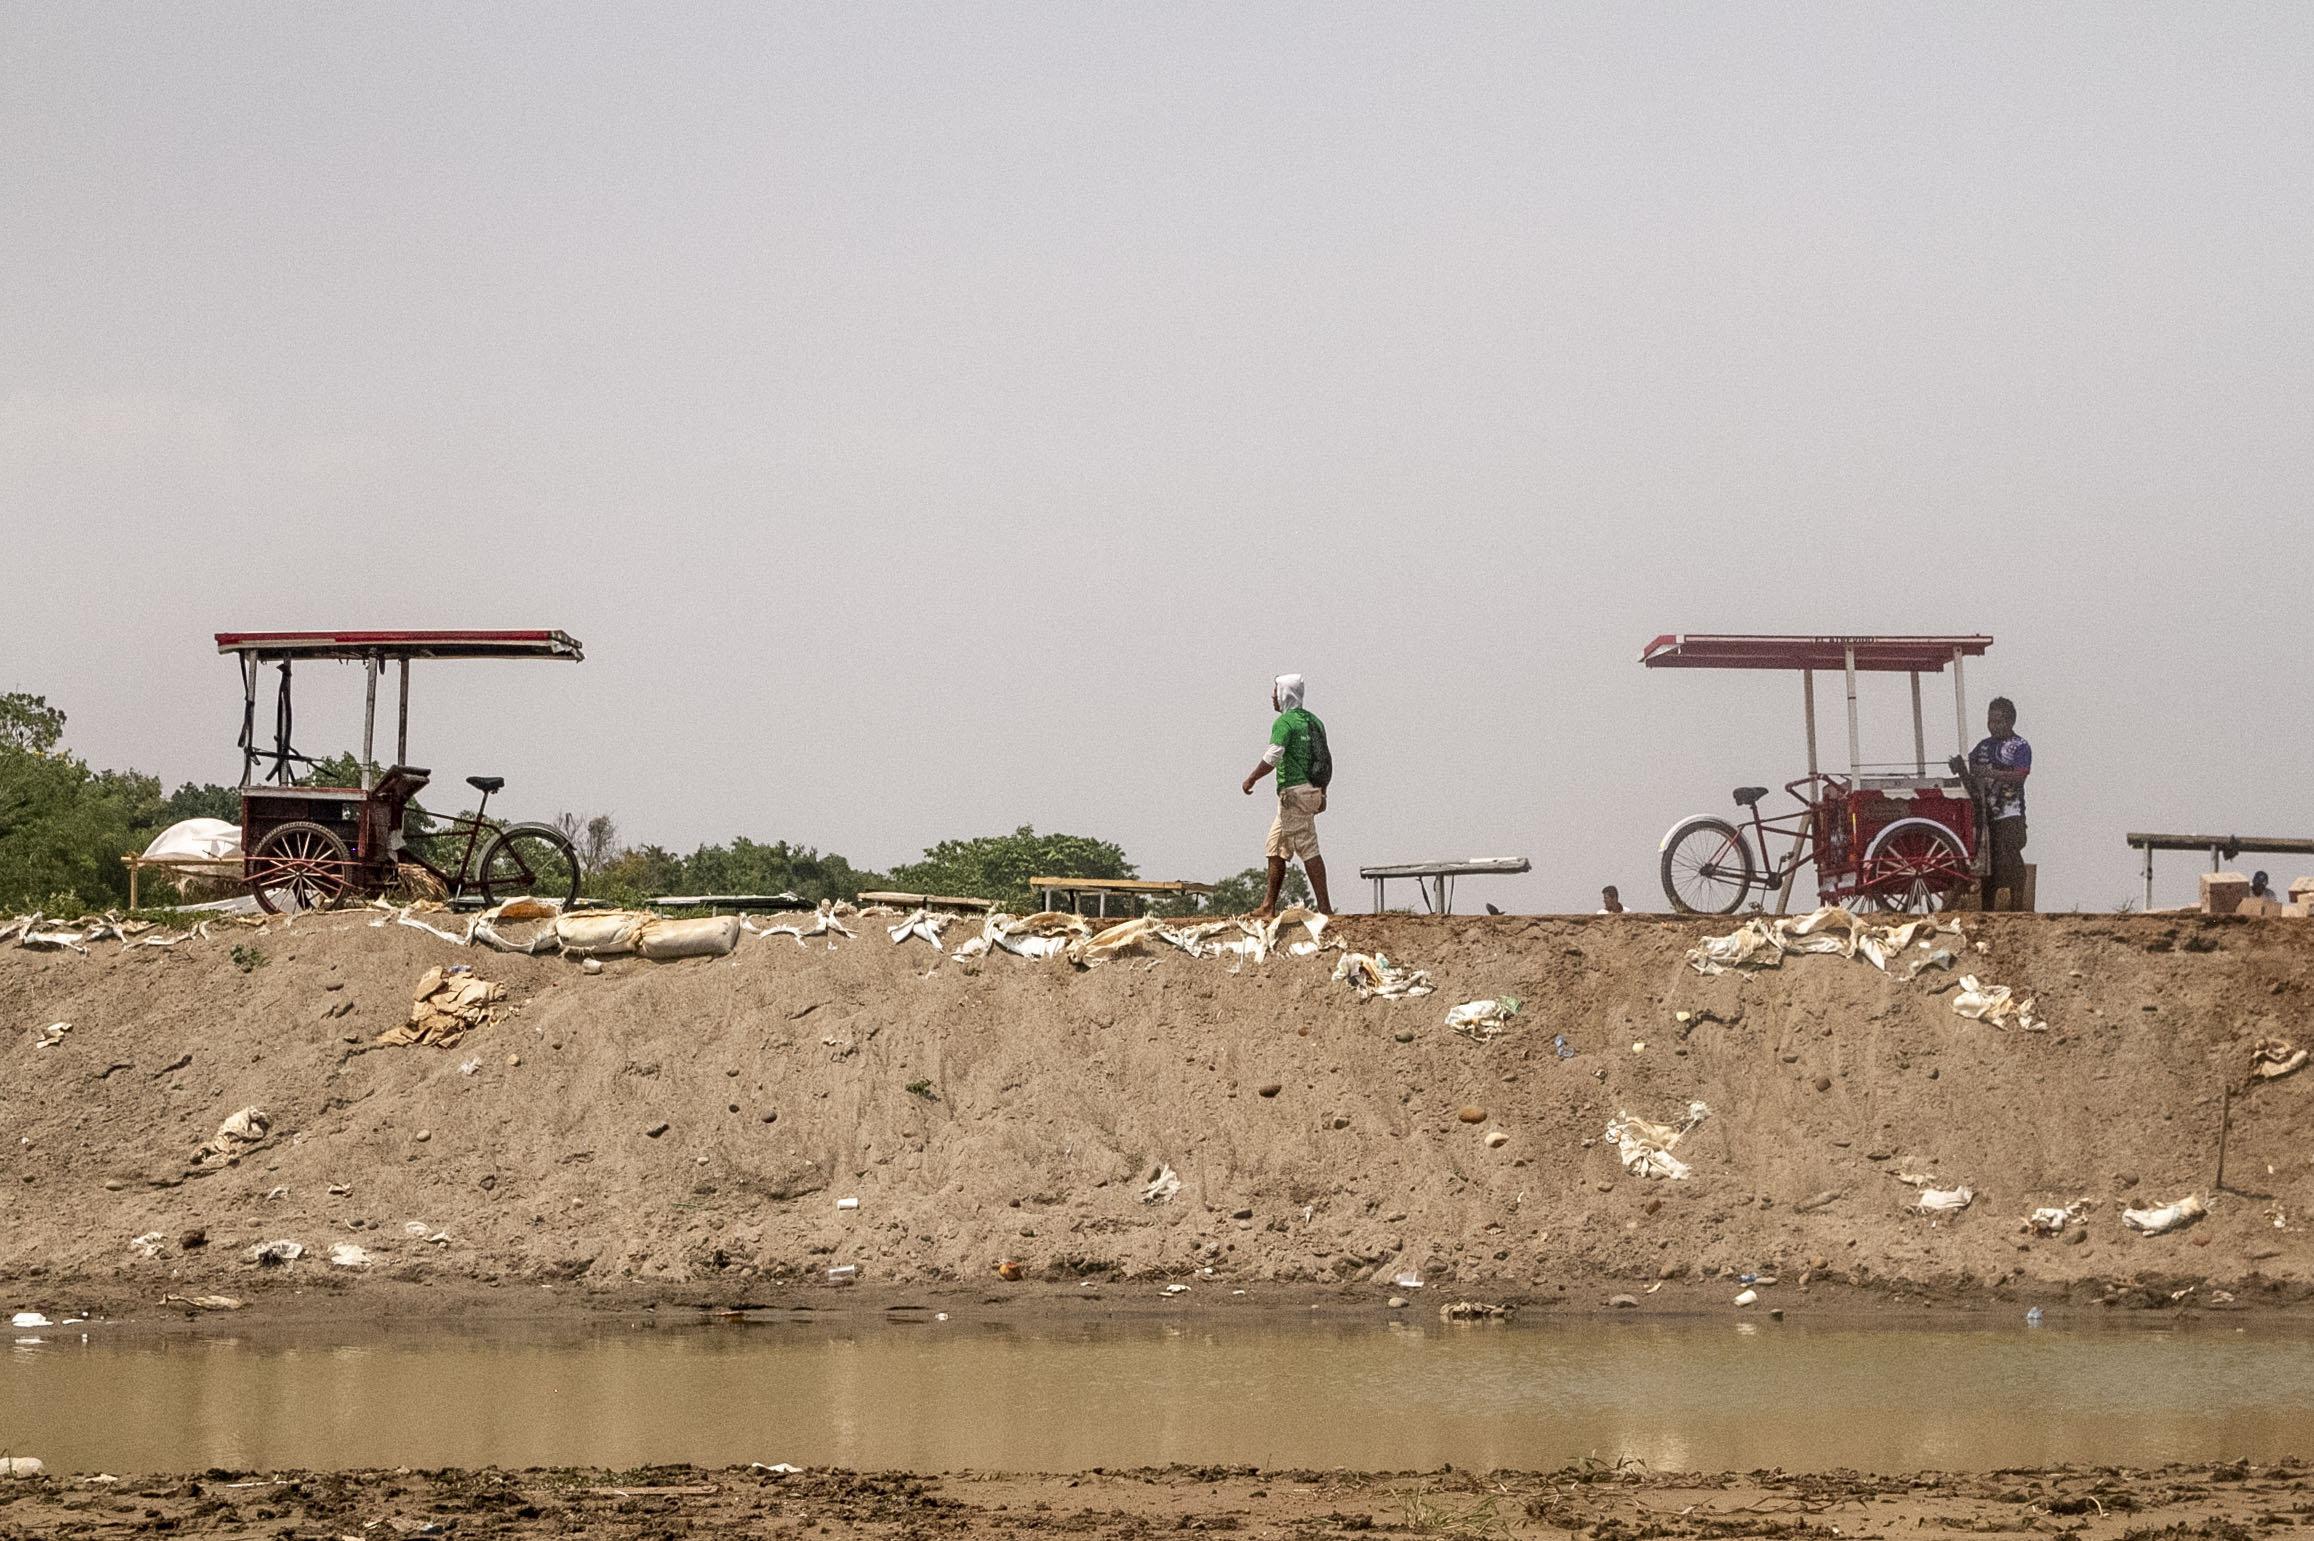 Suchiate, Chiapas. Hombre cruza el río Suchiate